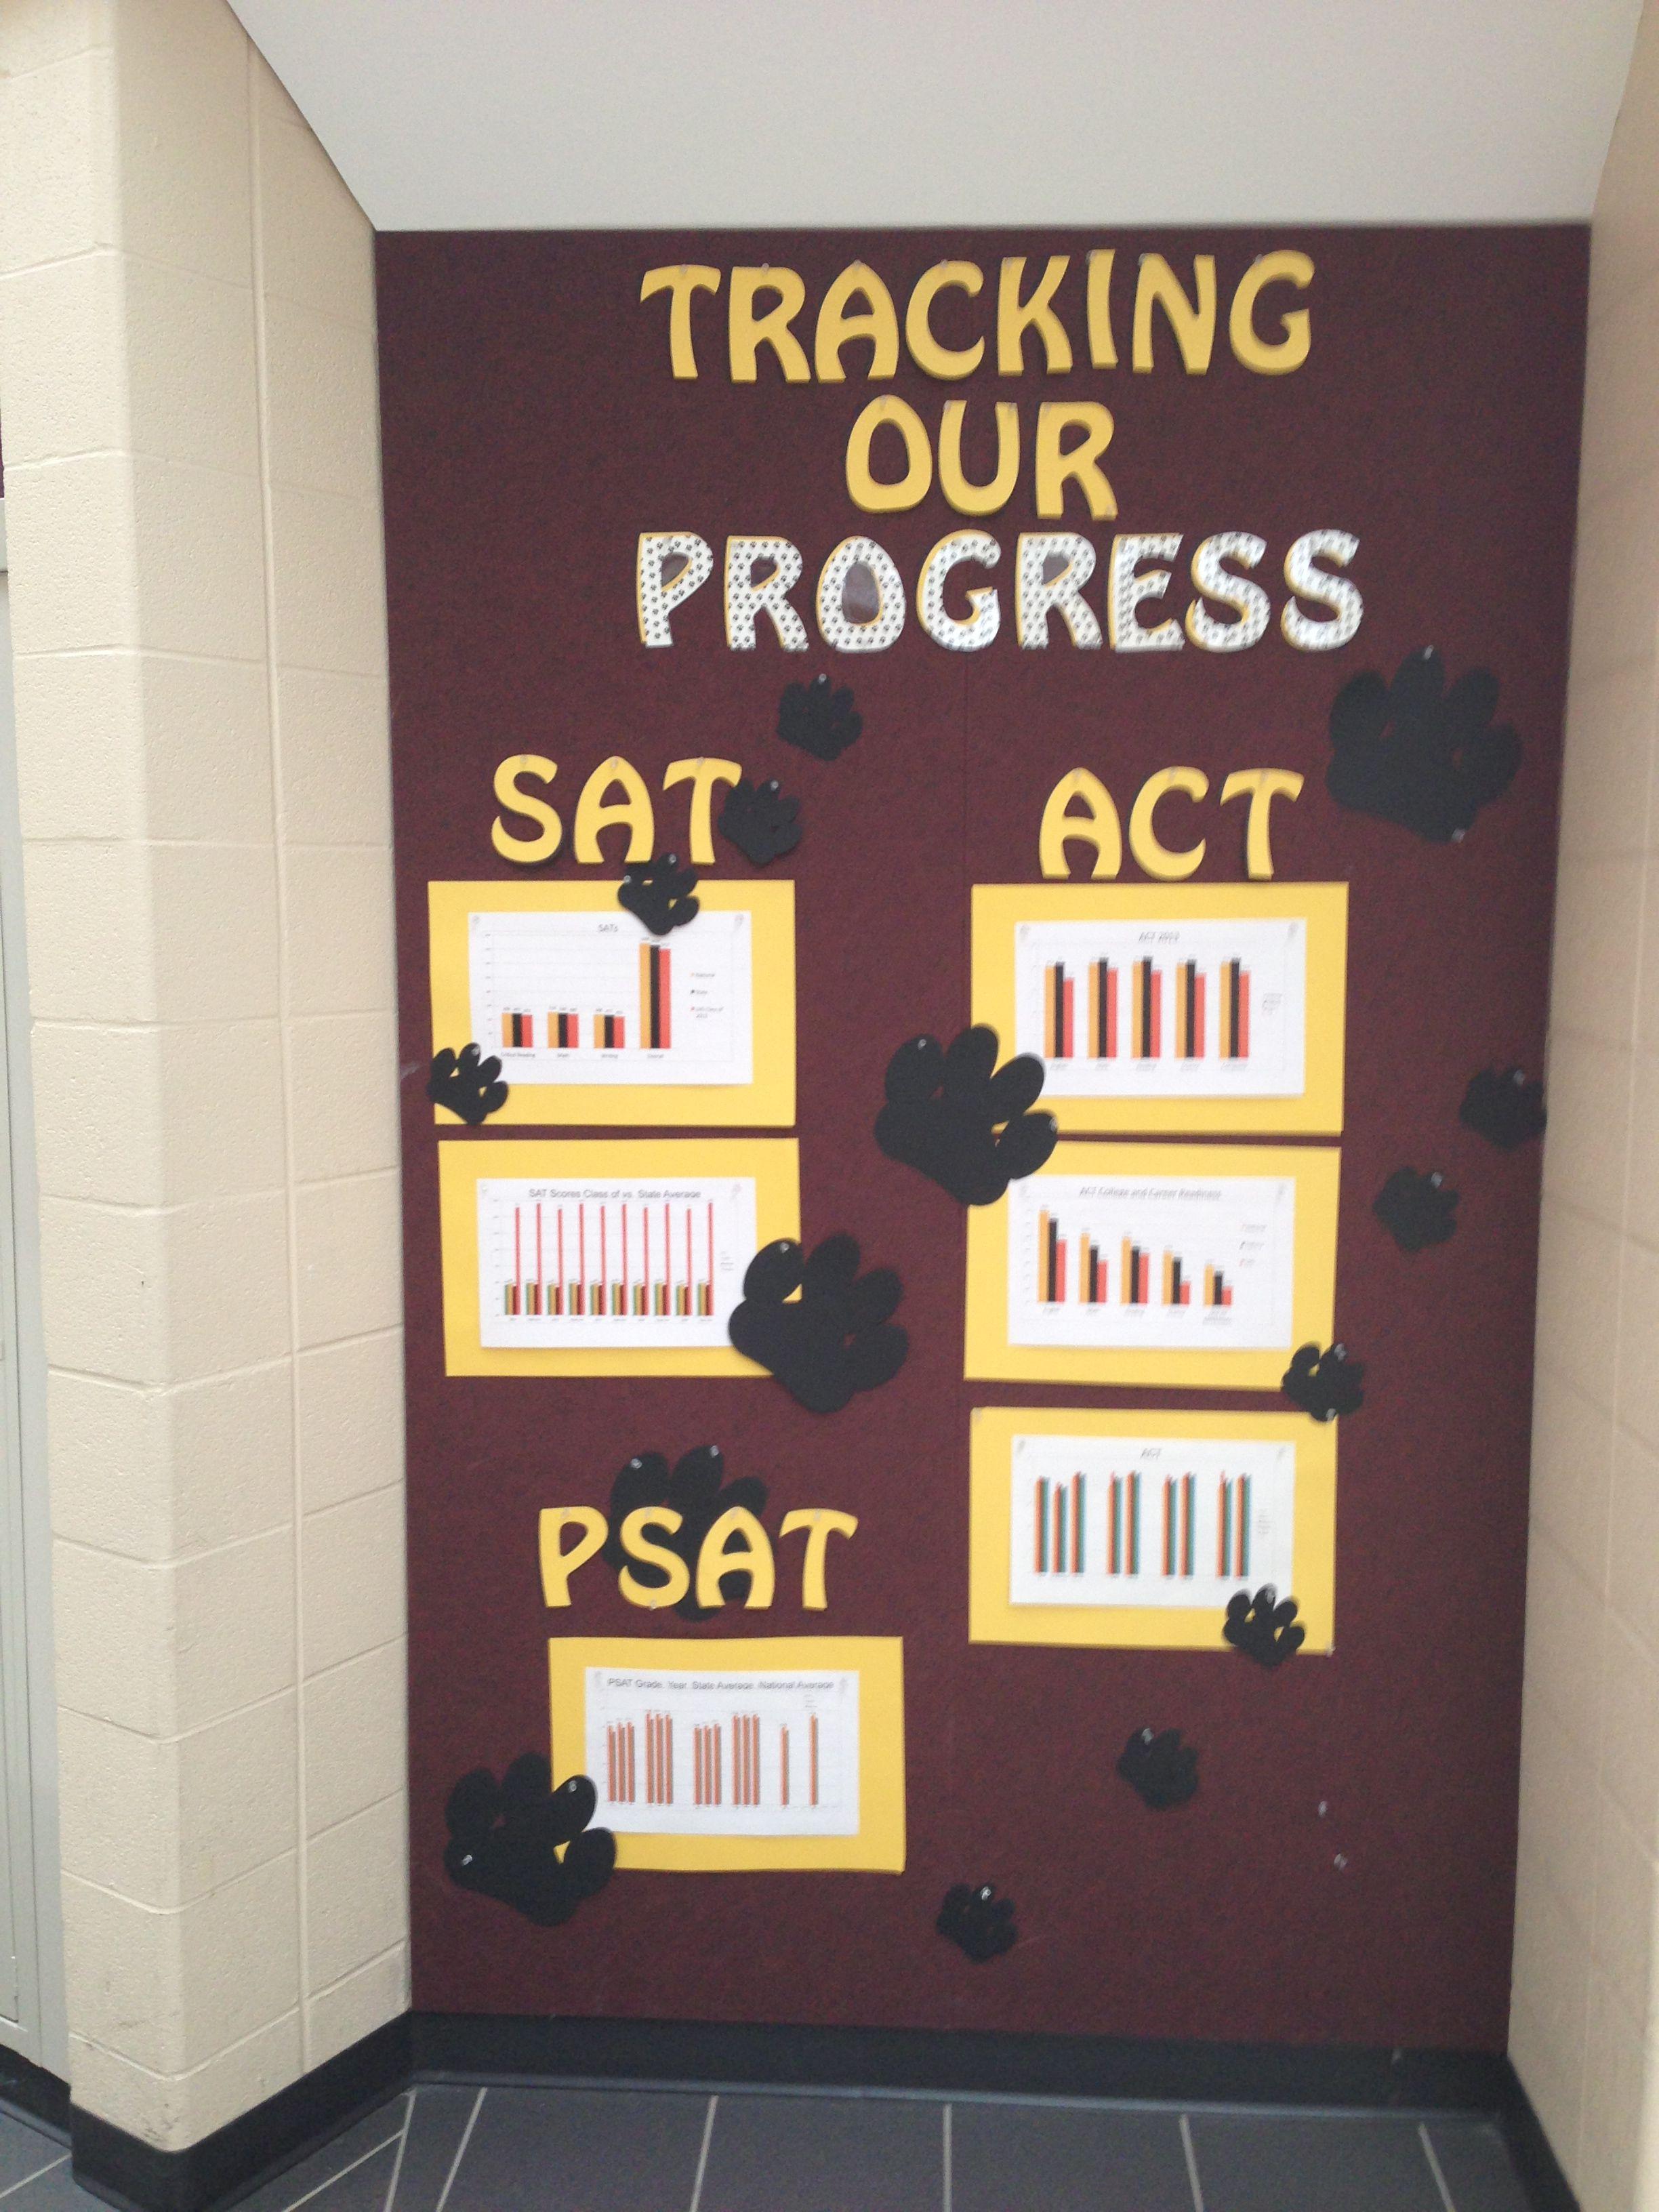 sat  act  psat data bulletin board at lowell high school